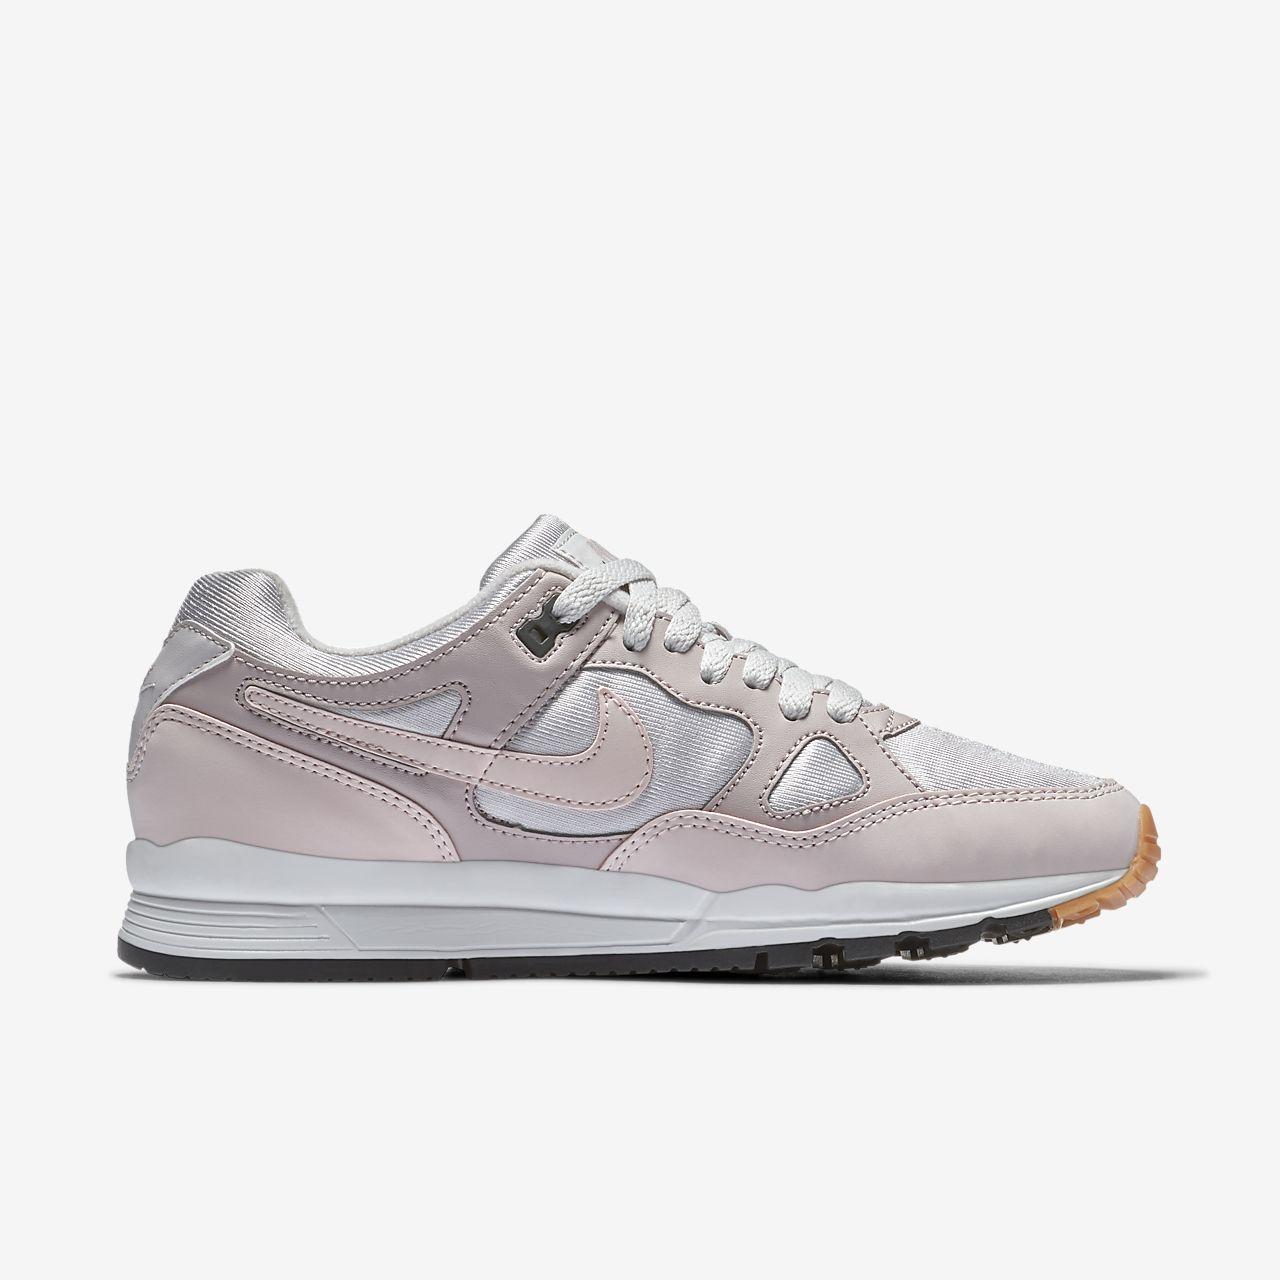 Nike - Air Span II - Baskets - Rose - Rose 0 EU Etnies Metal Mulisha Fader Chaussure - white black print RLhWqa